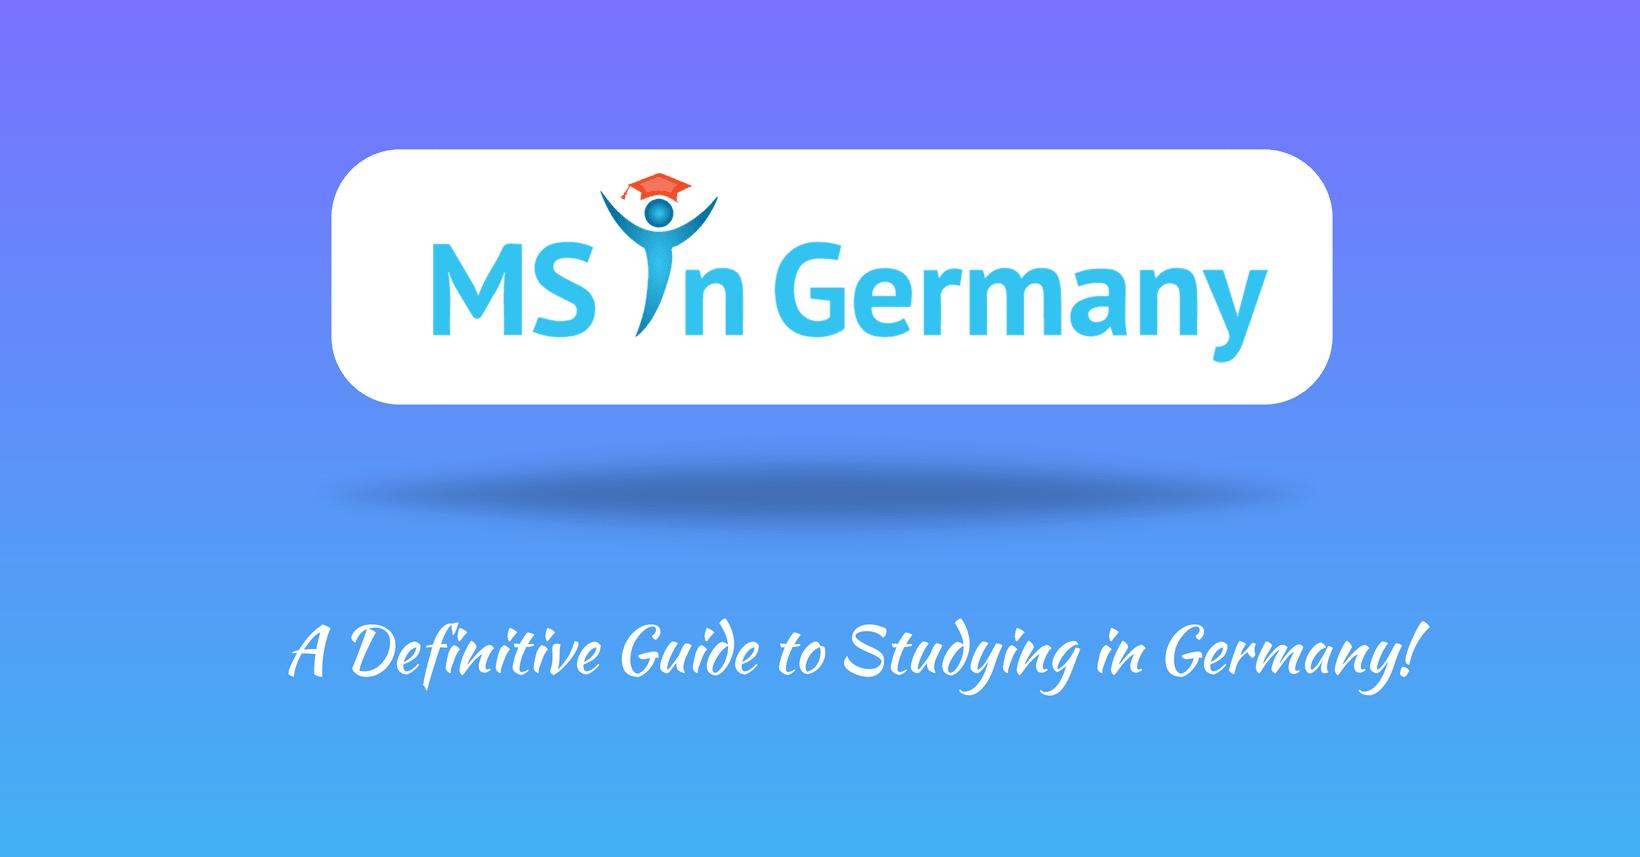 Study in Germany   MS in Germany   Higher Studies in Germany